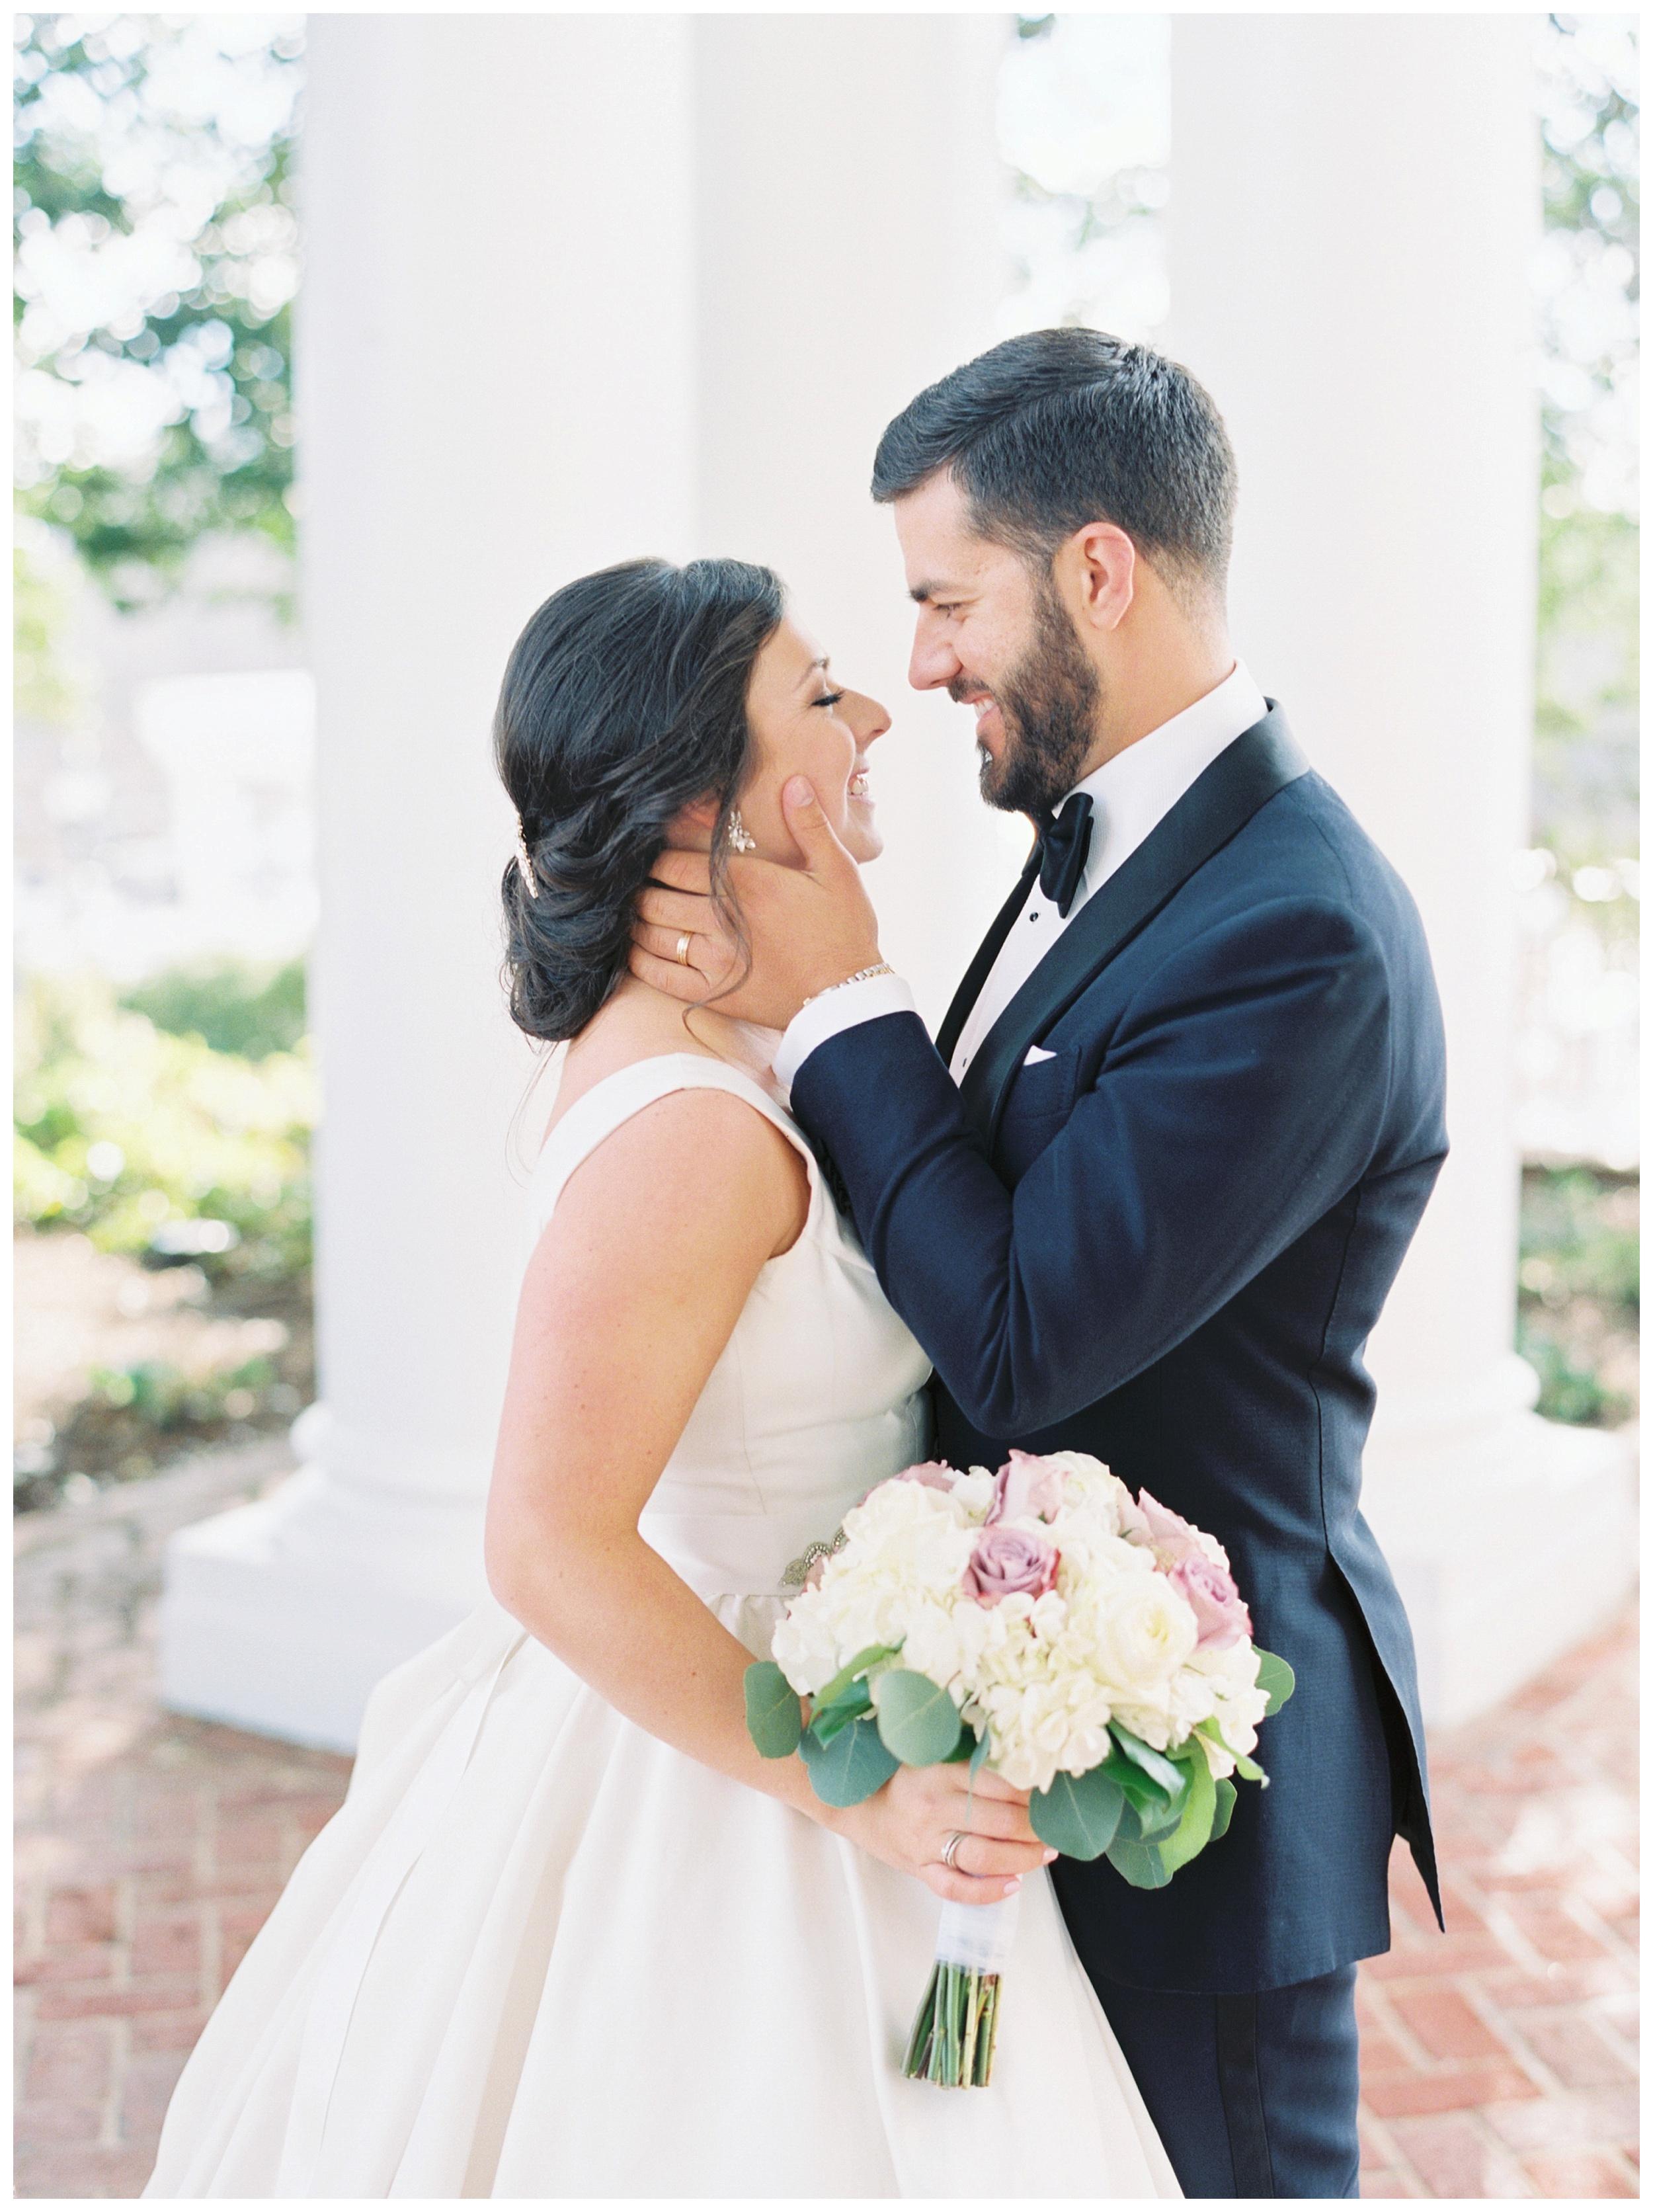 Country Club of Virginia Wedding | Richmond Wedding Photographer_0103.jpg